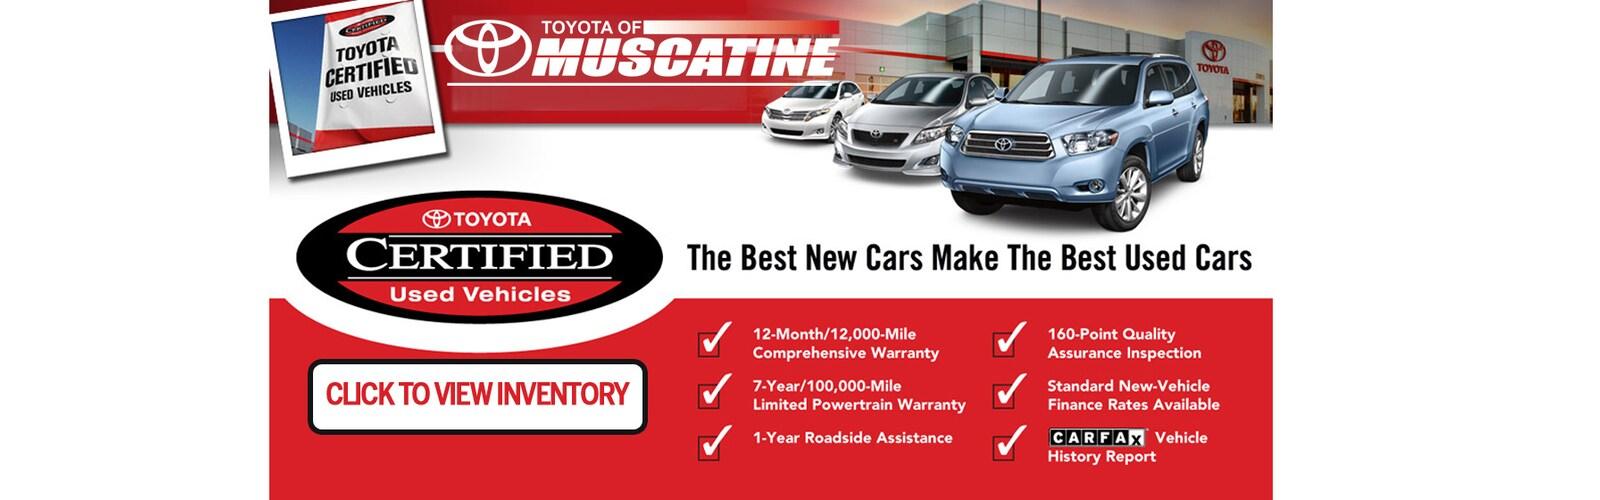 New Used Cars Trucks Toyota Of Muscatine Muscatine Ia